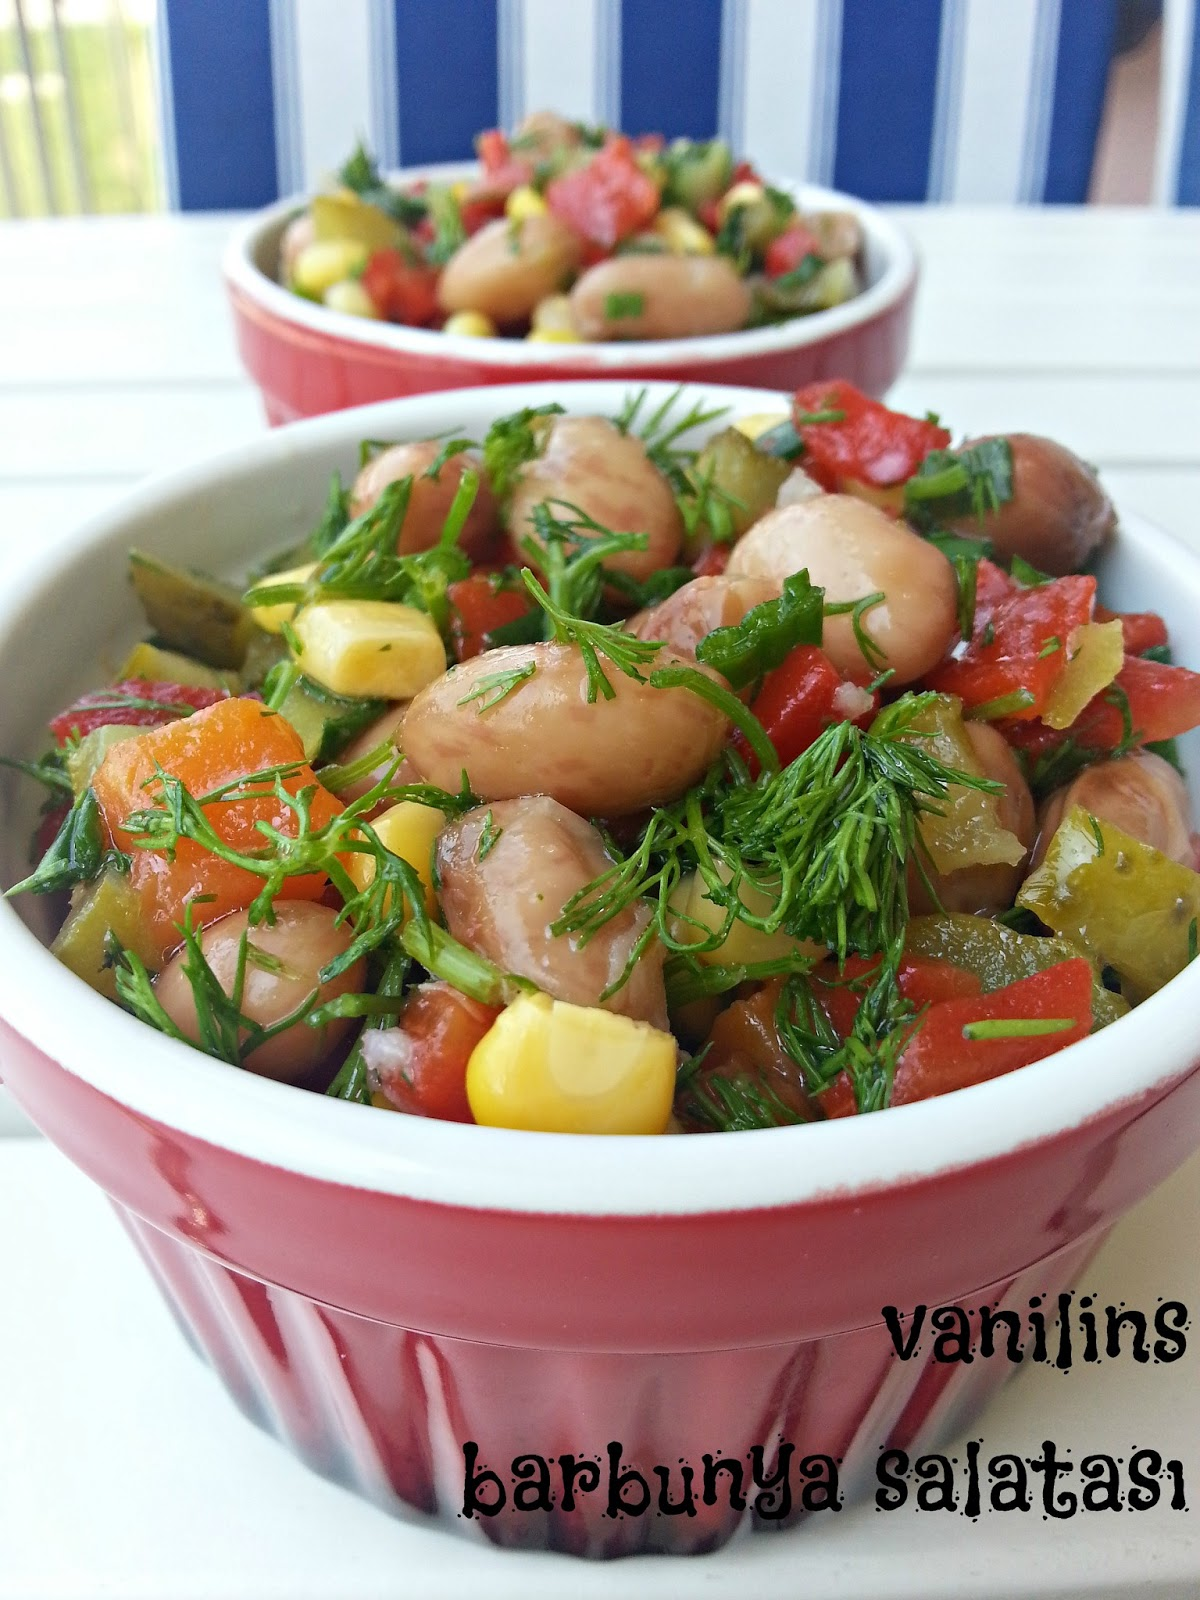 Barbunya Salatası Videosu